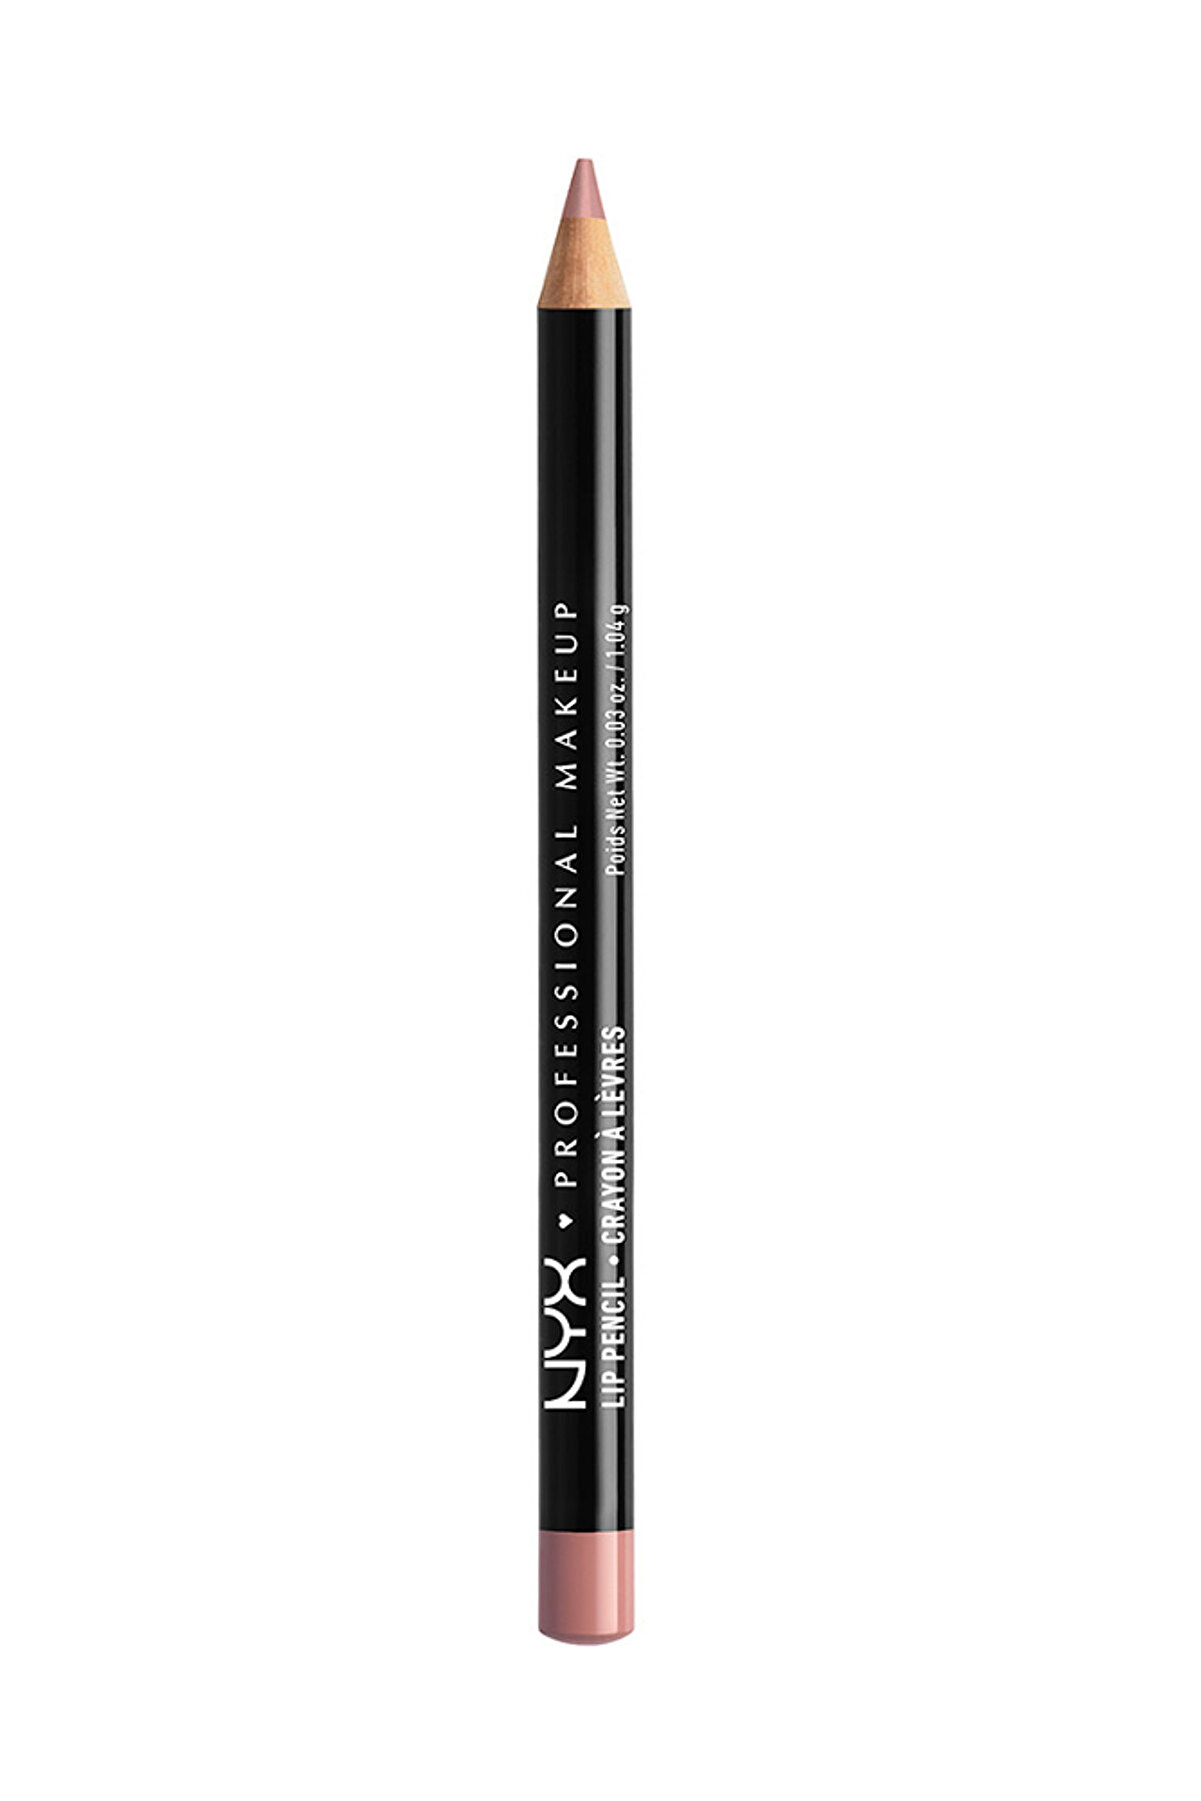 NYX Professional Makeup Dudak Kalemi - Slim Lip Pencil Pale Pink 800897139407